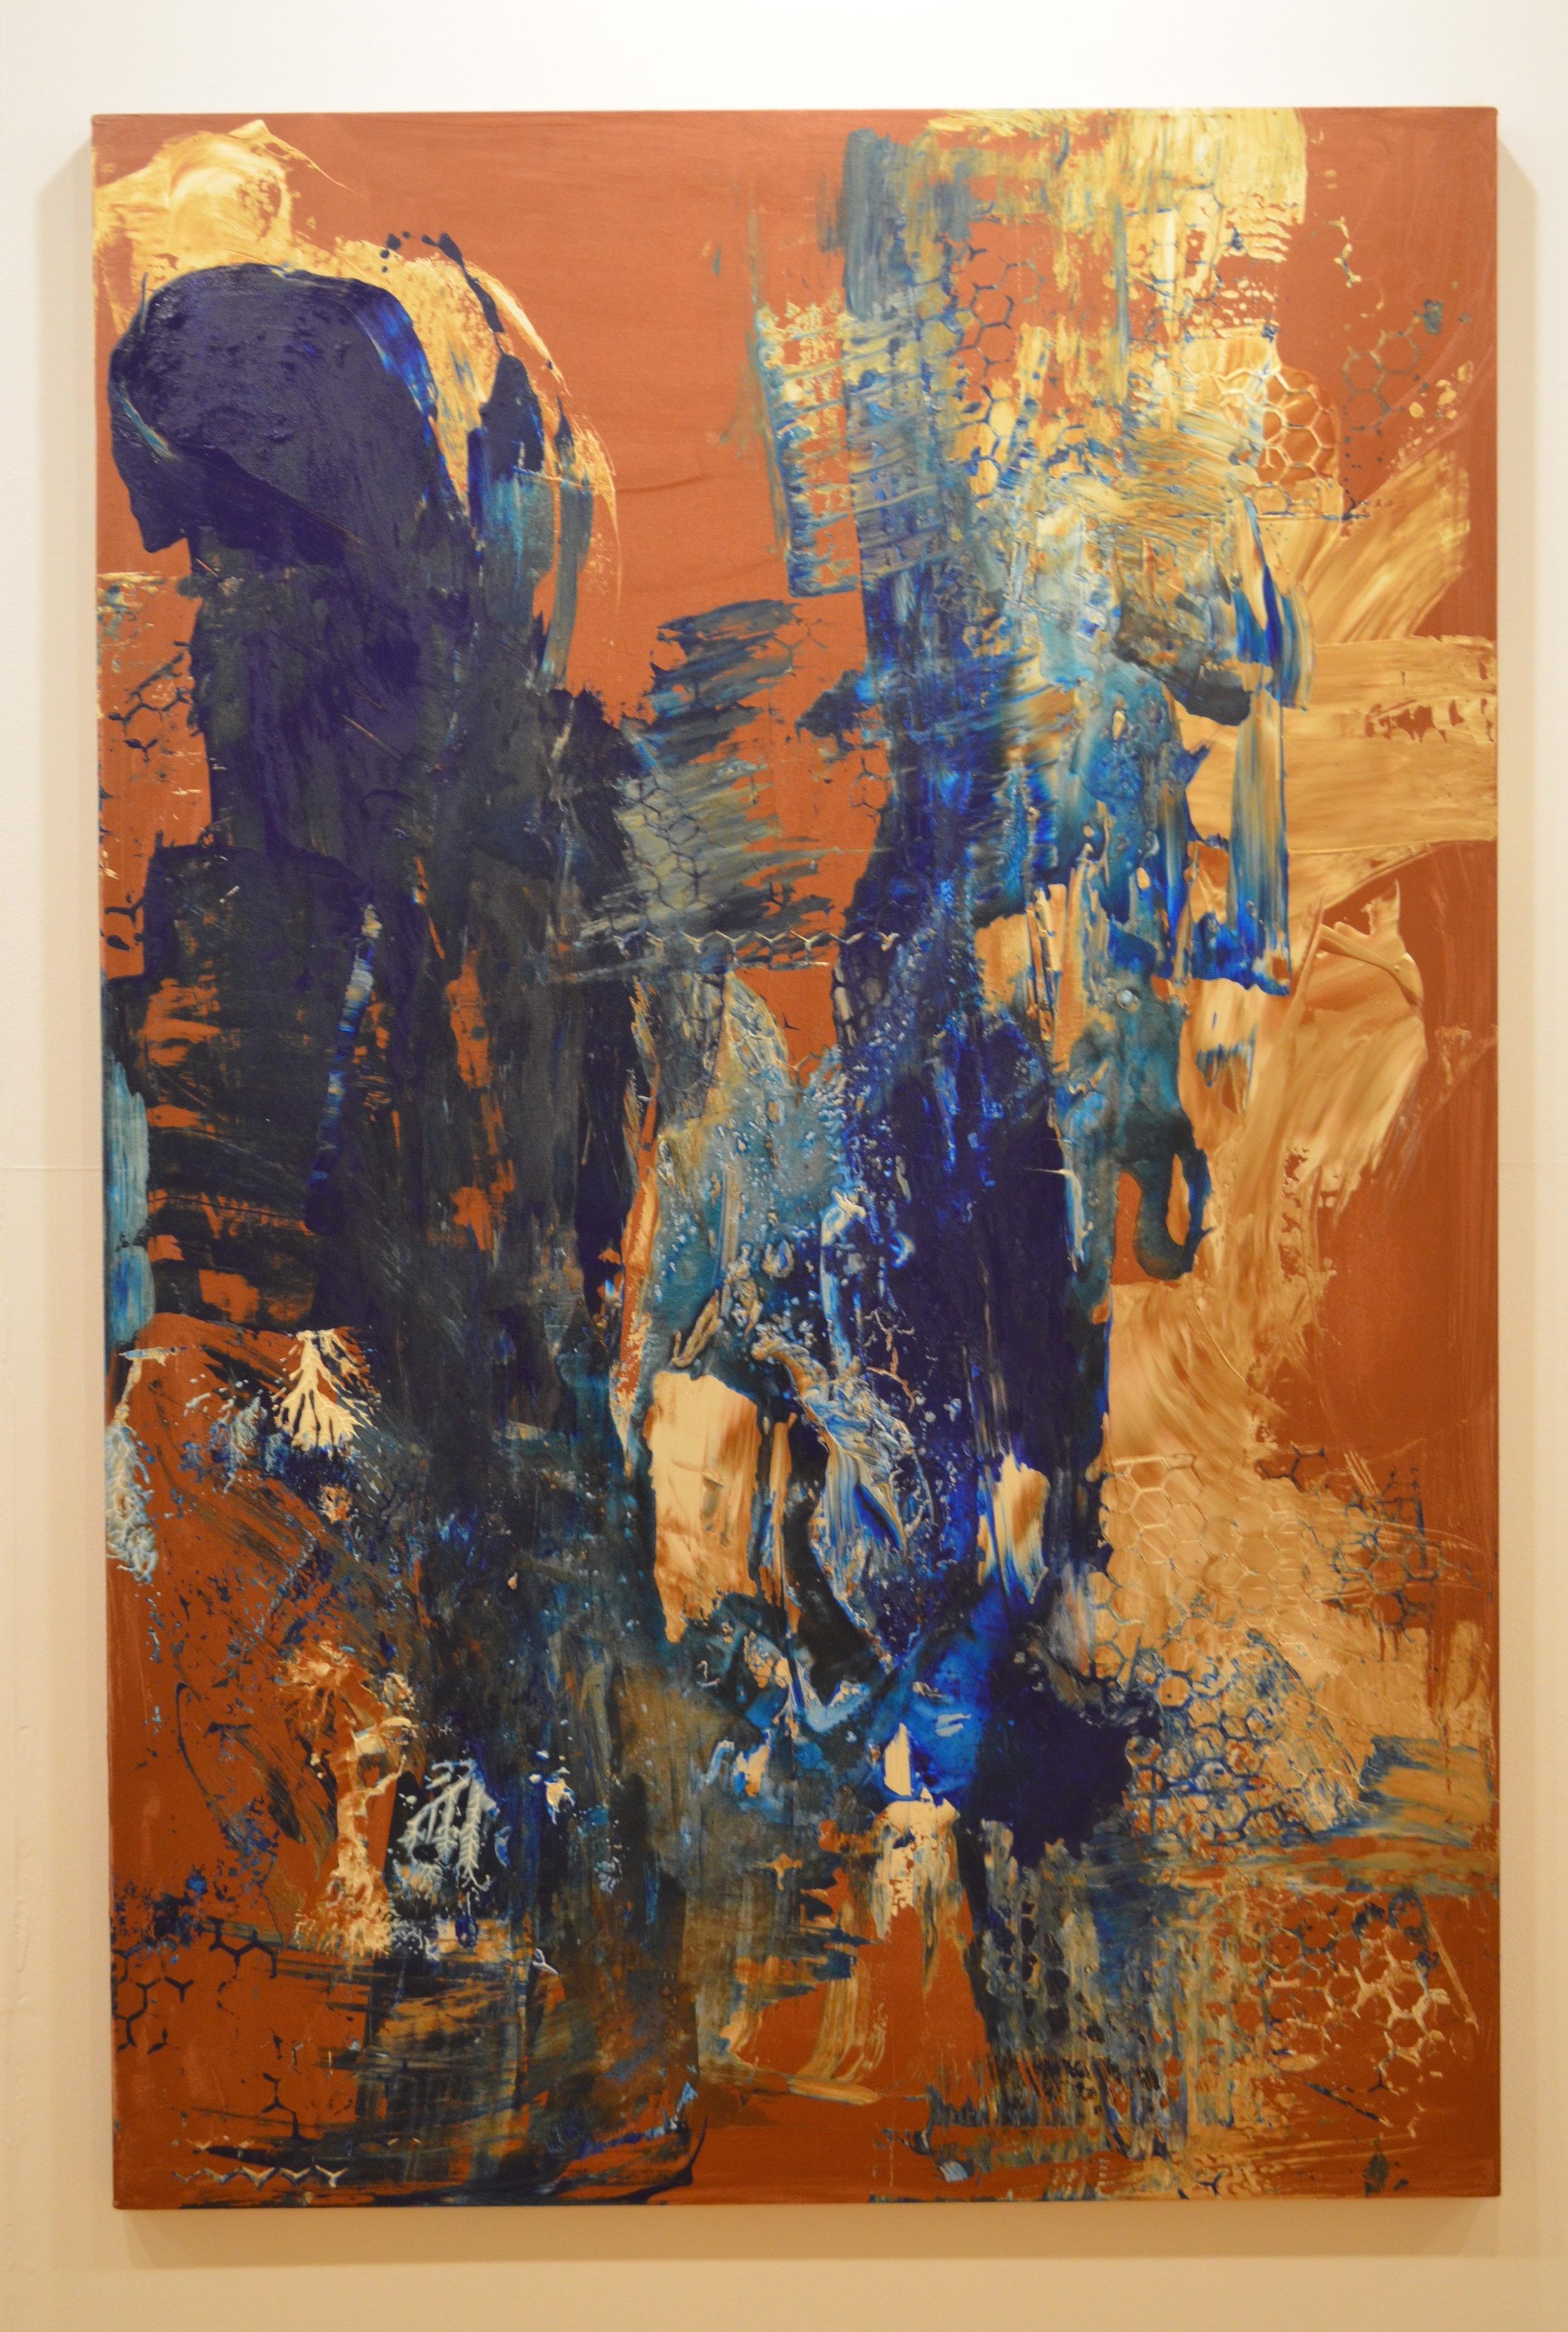 7. Washed Ashore, Natasha Shoro, 72 x 48 inches, $6,500